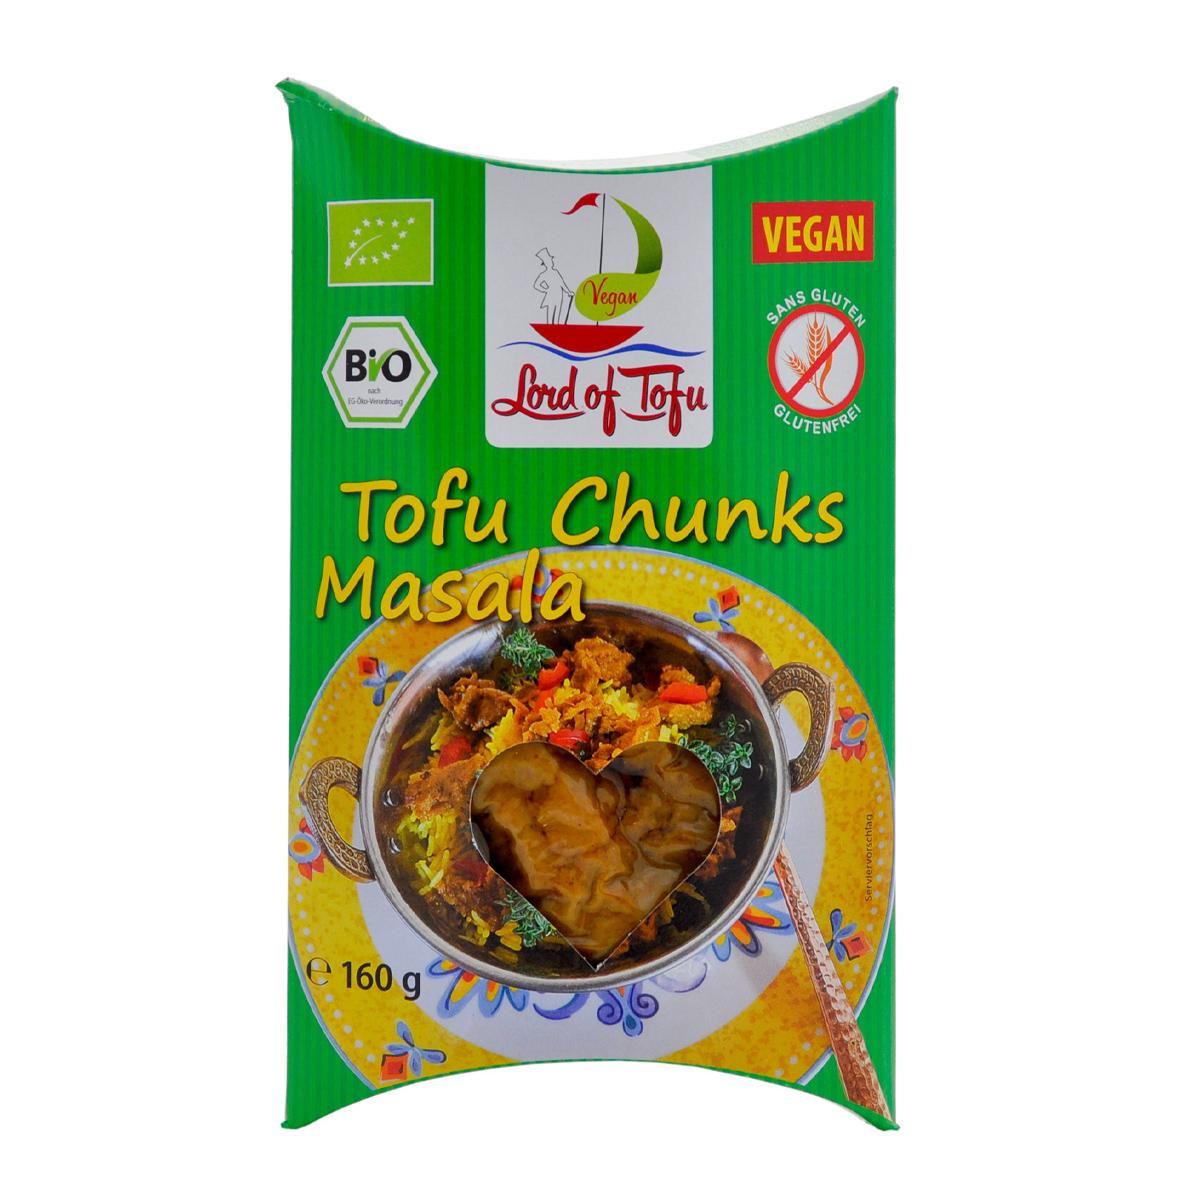 Lord of Tofu - Tofu Chicken Masala 160g